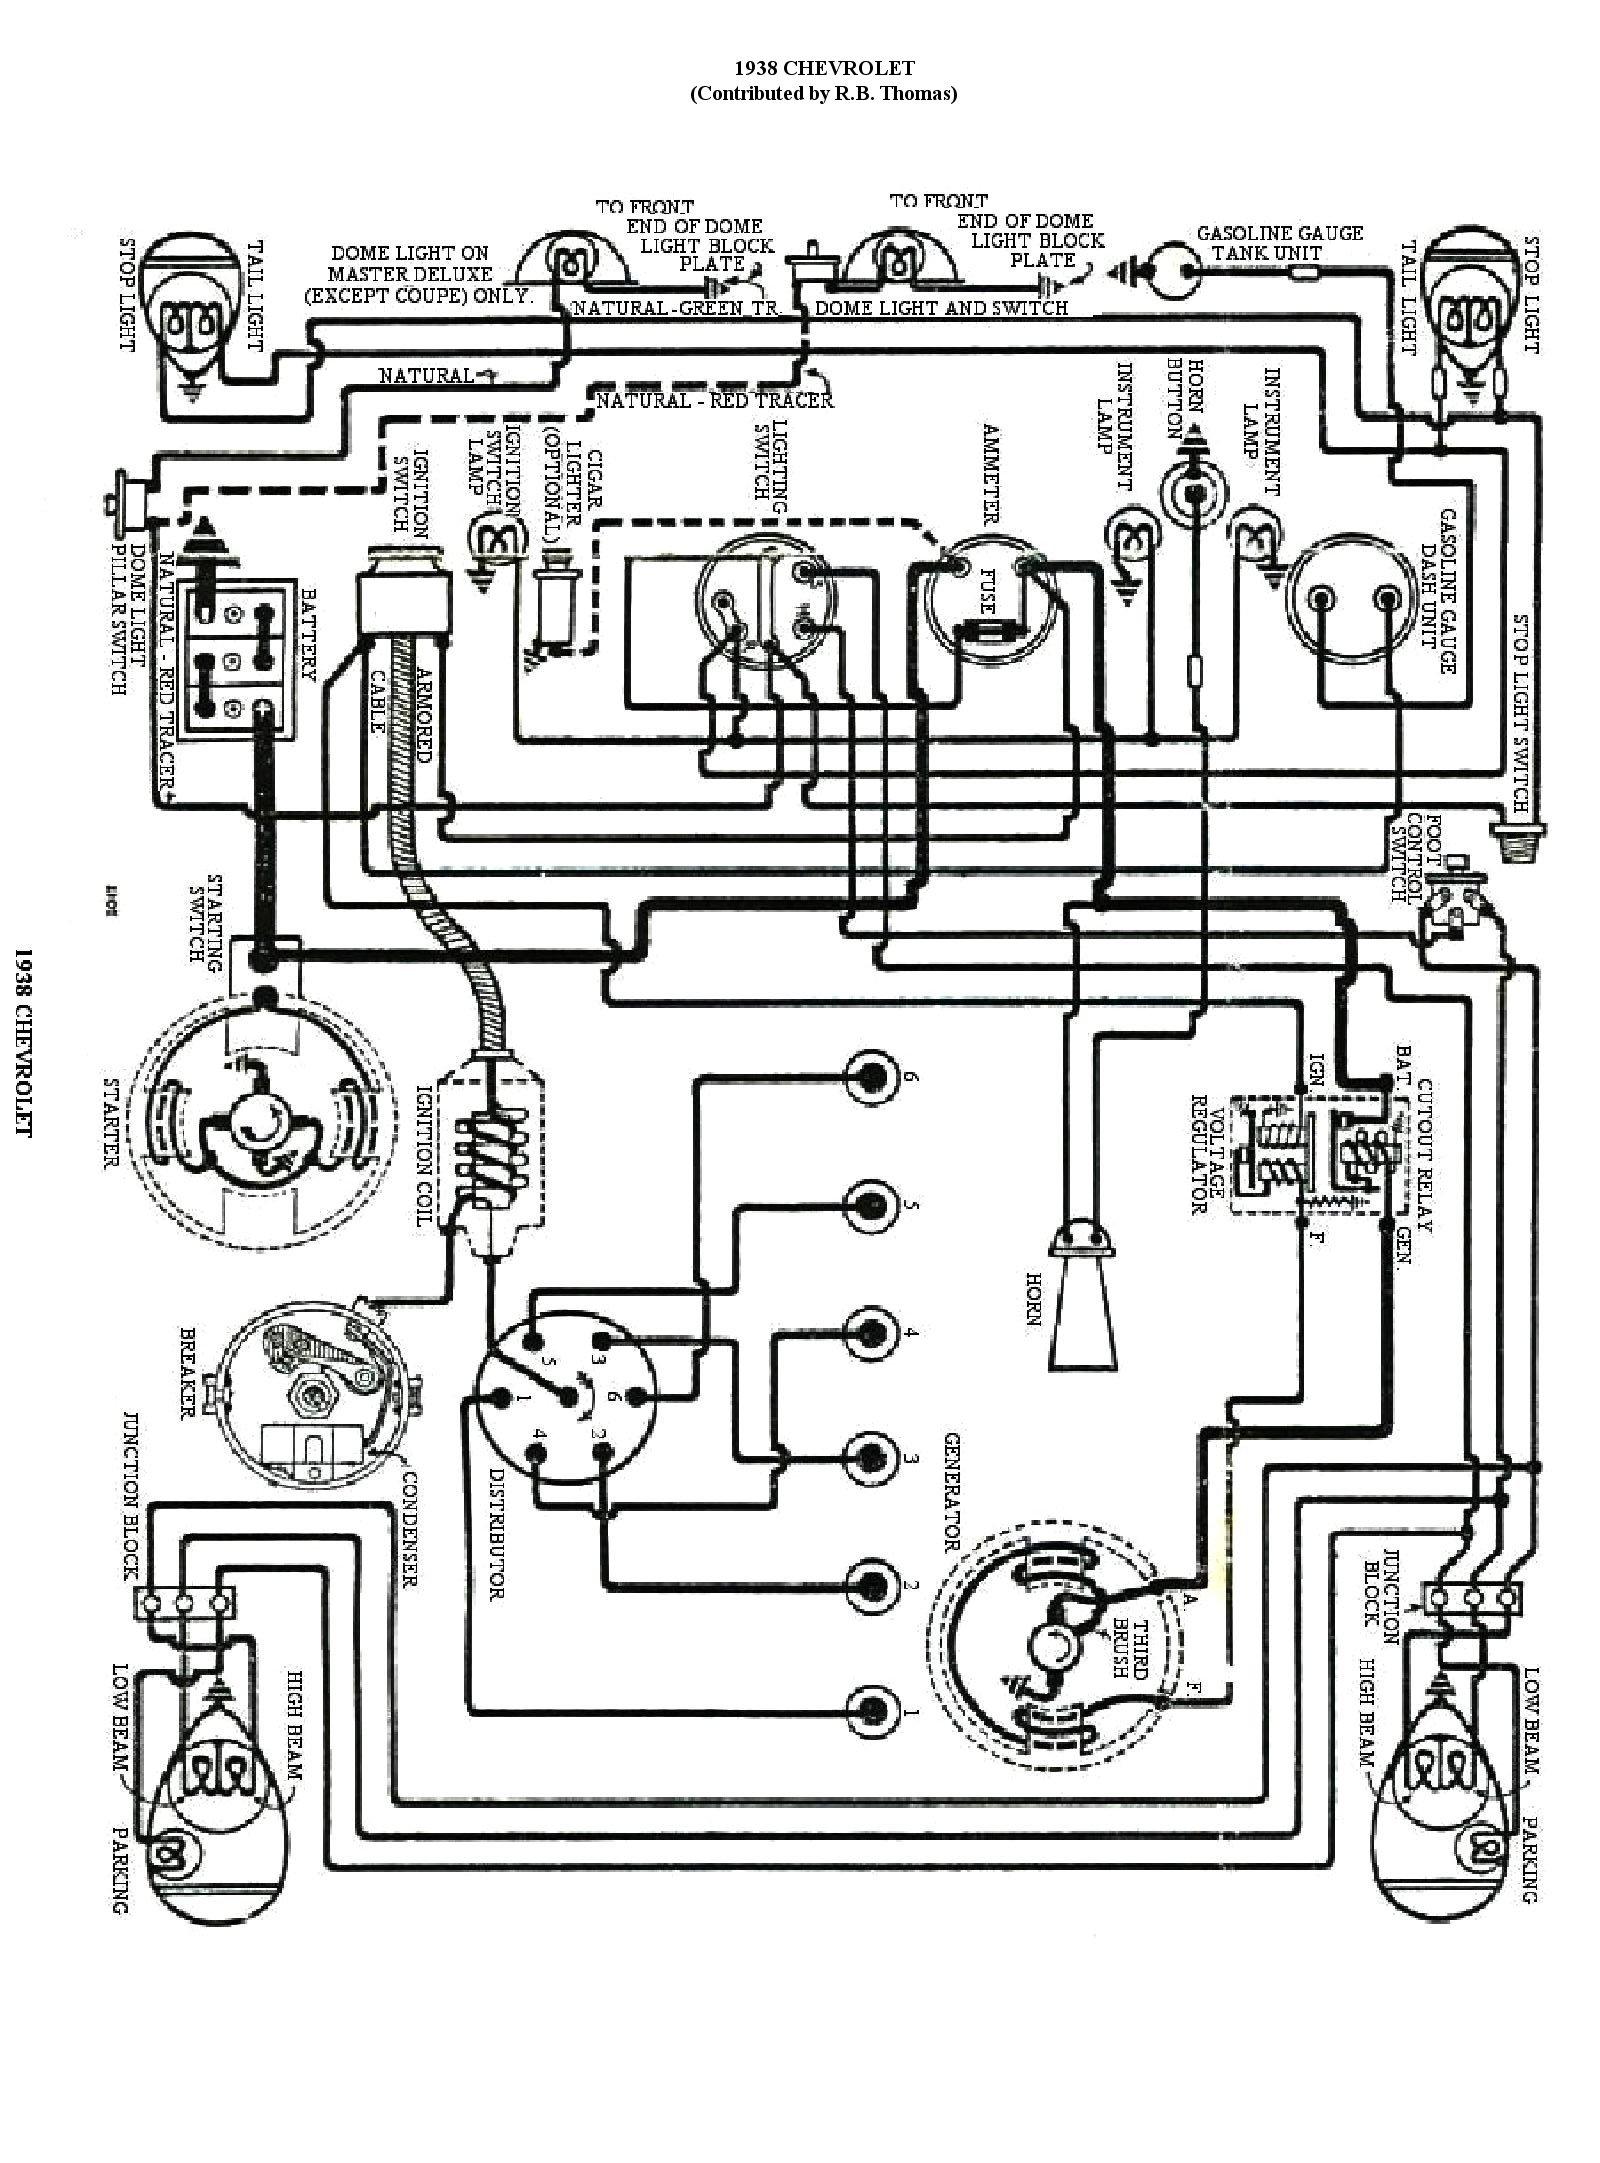 gauge wiring diagram on 1955 2nd series chevy truck wiring diagram